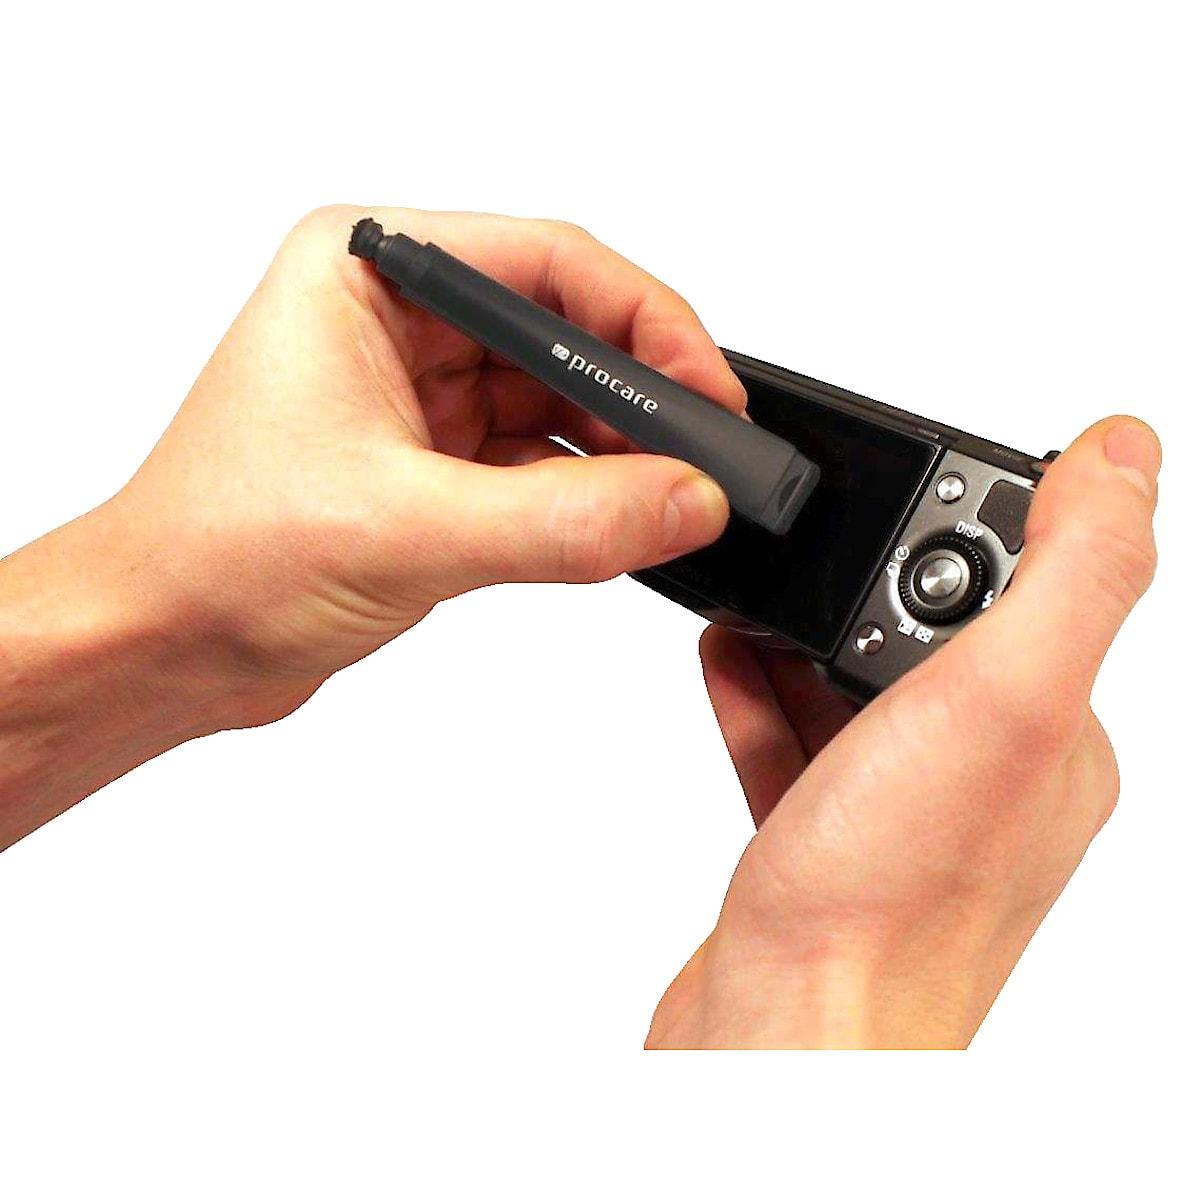 Procare kamera/optikkrengjøring